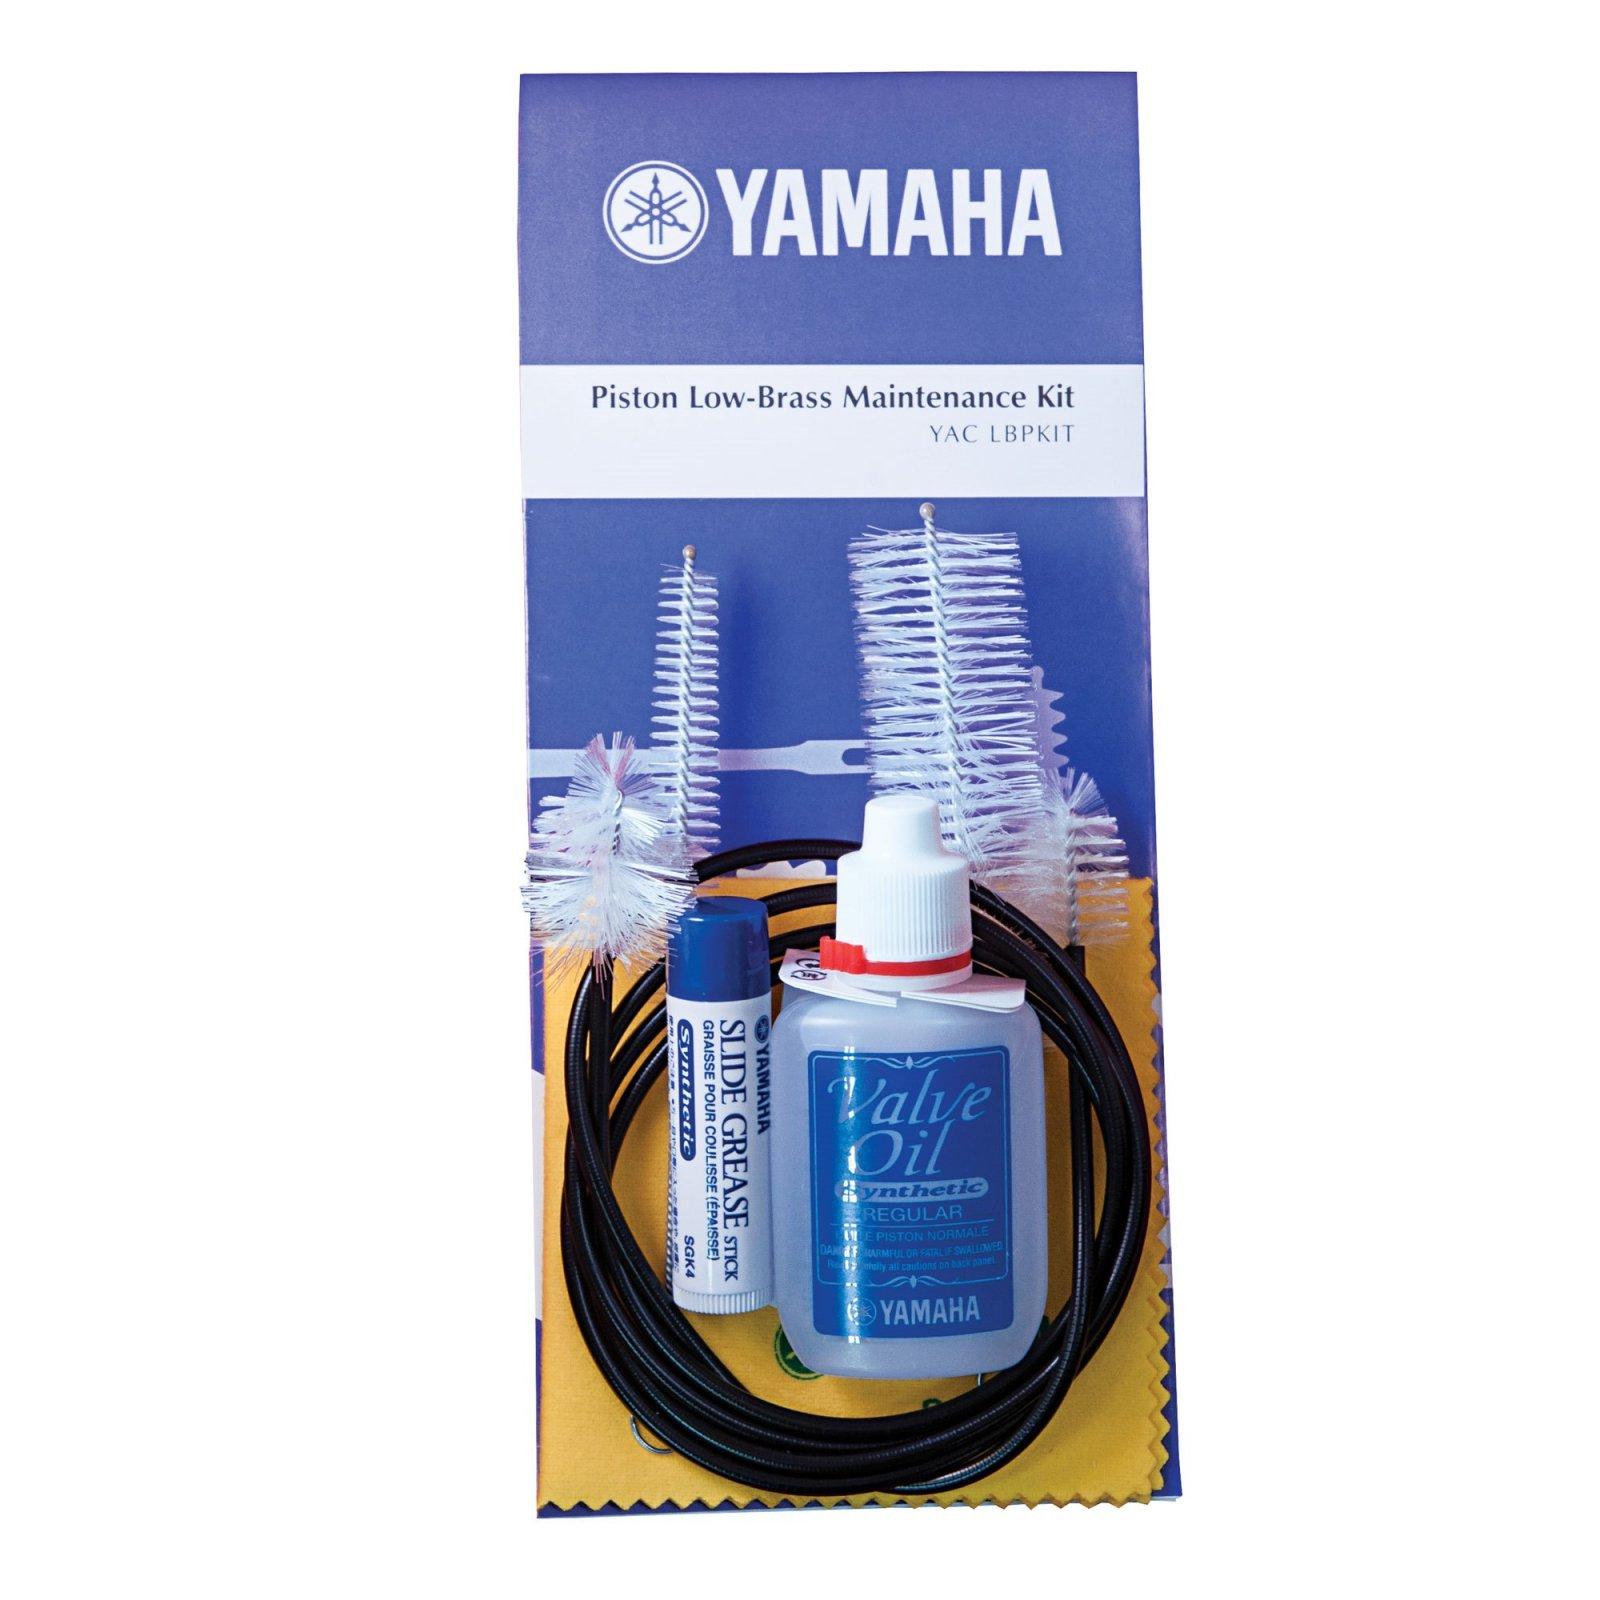 Yamaha Piston Low-Brass Maintenance Kit